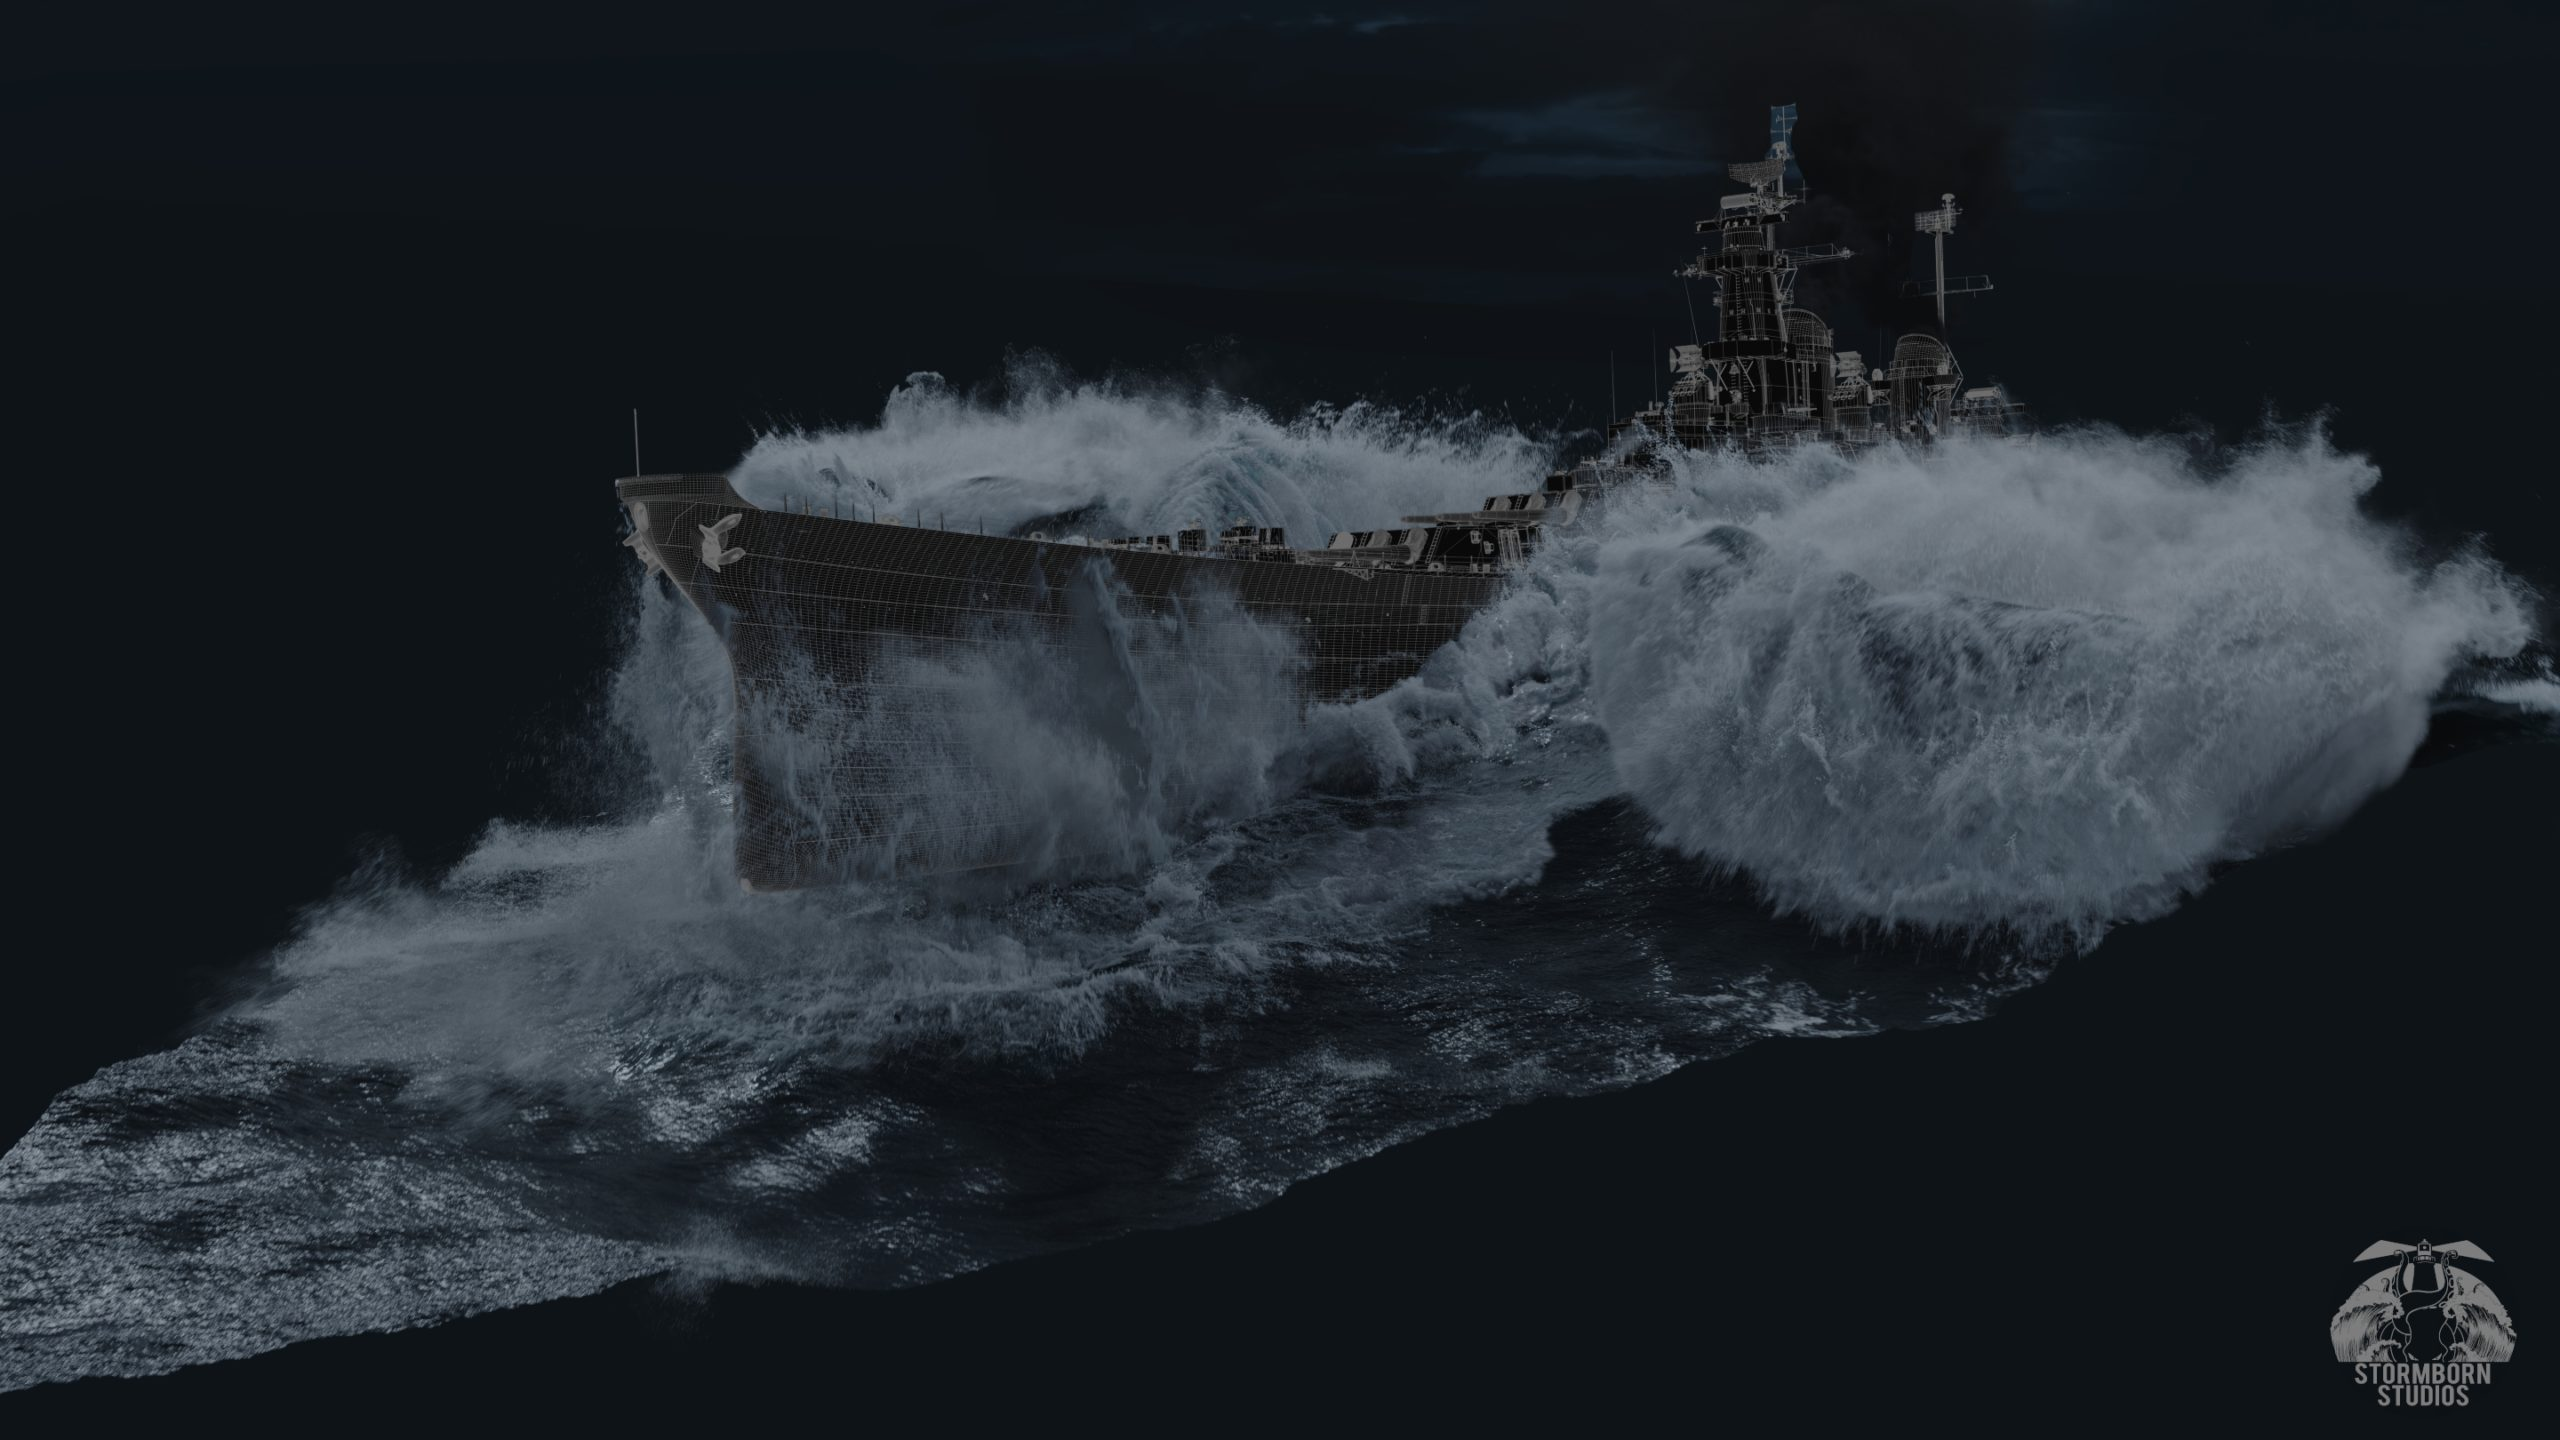 Stormborn Studios Water Simulations